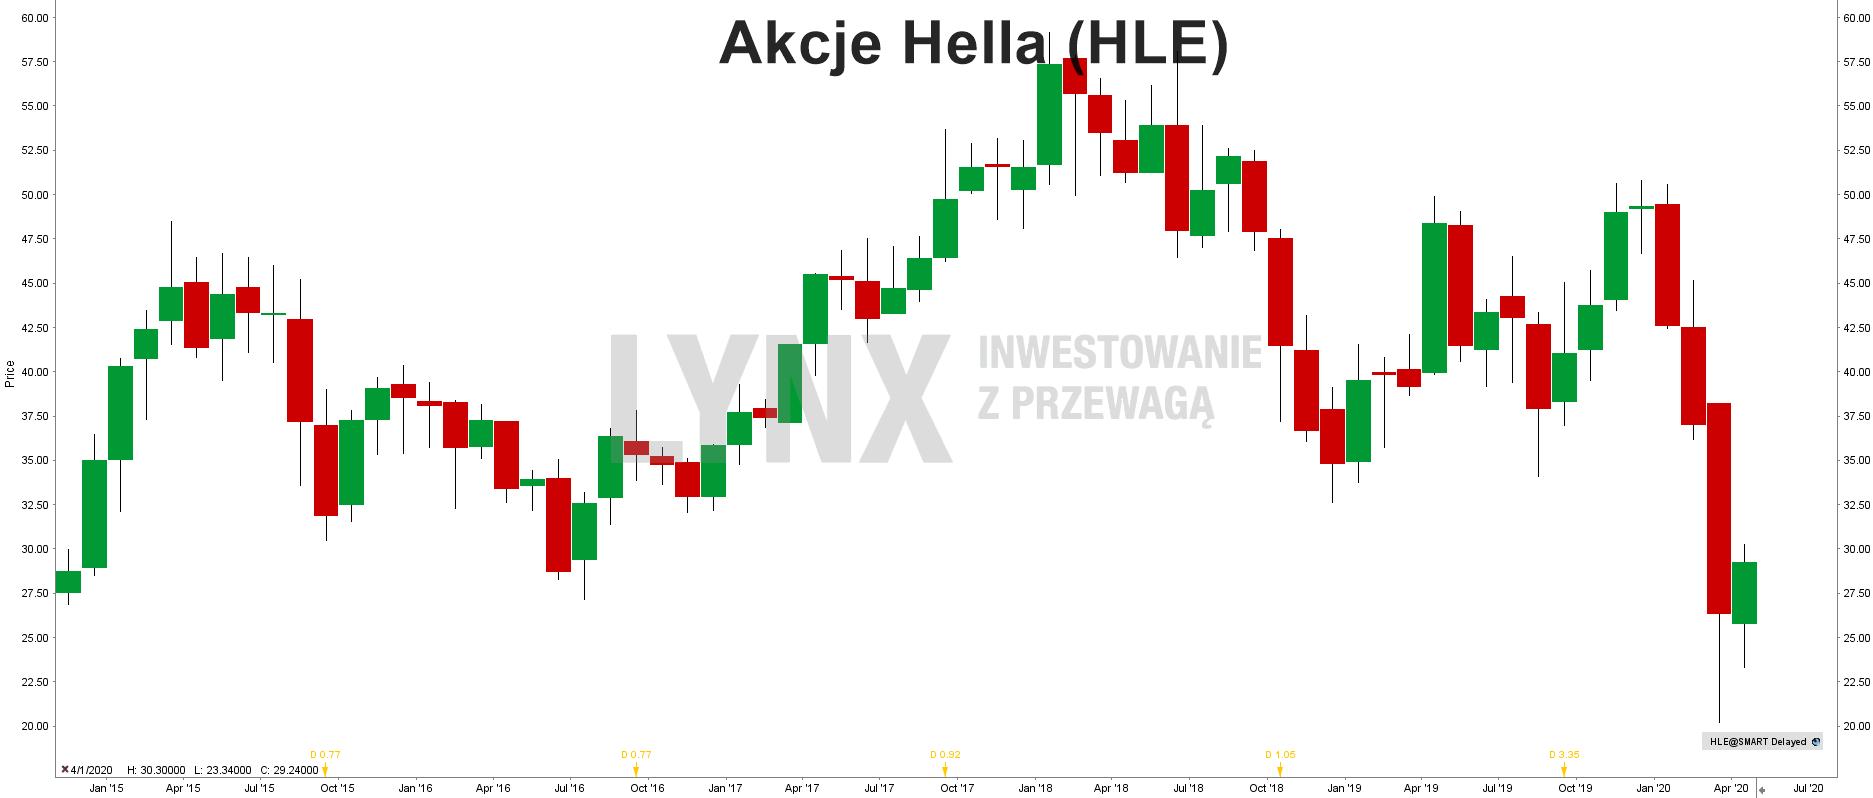 Akcje Hella (HLE)